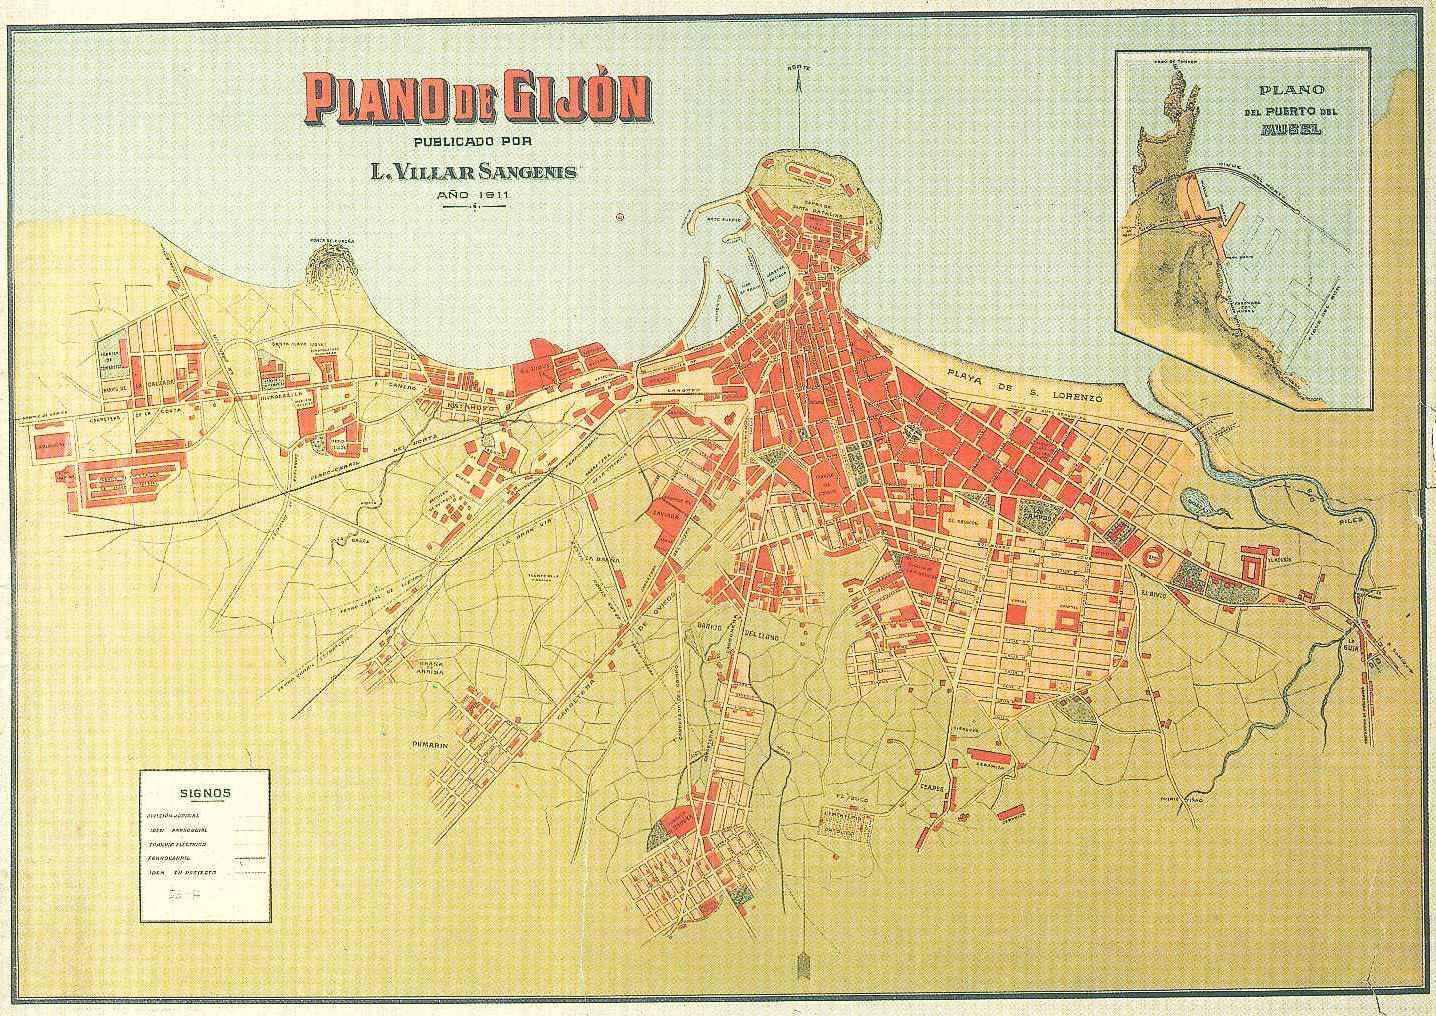 Mapa Carril Bici Gijon.Web Oficial De Gijon